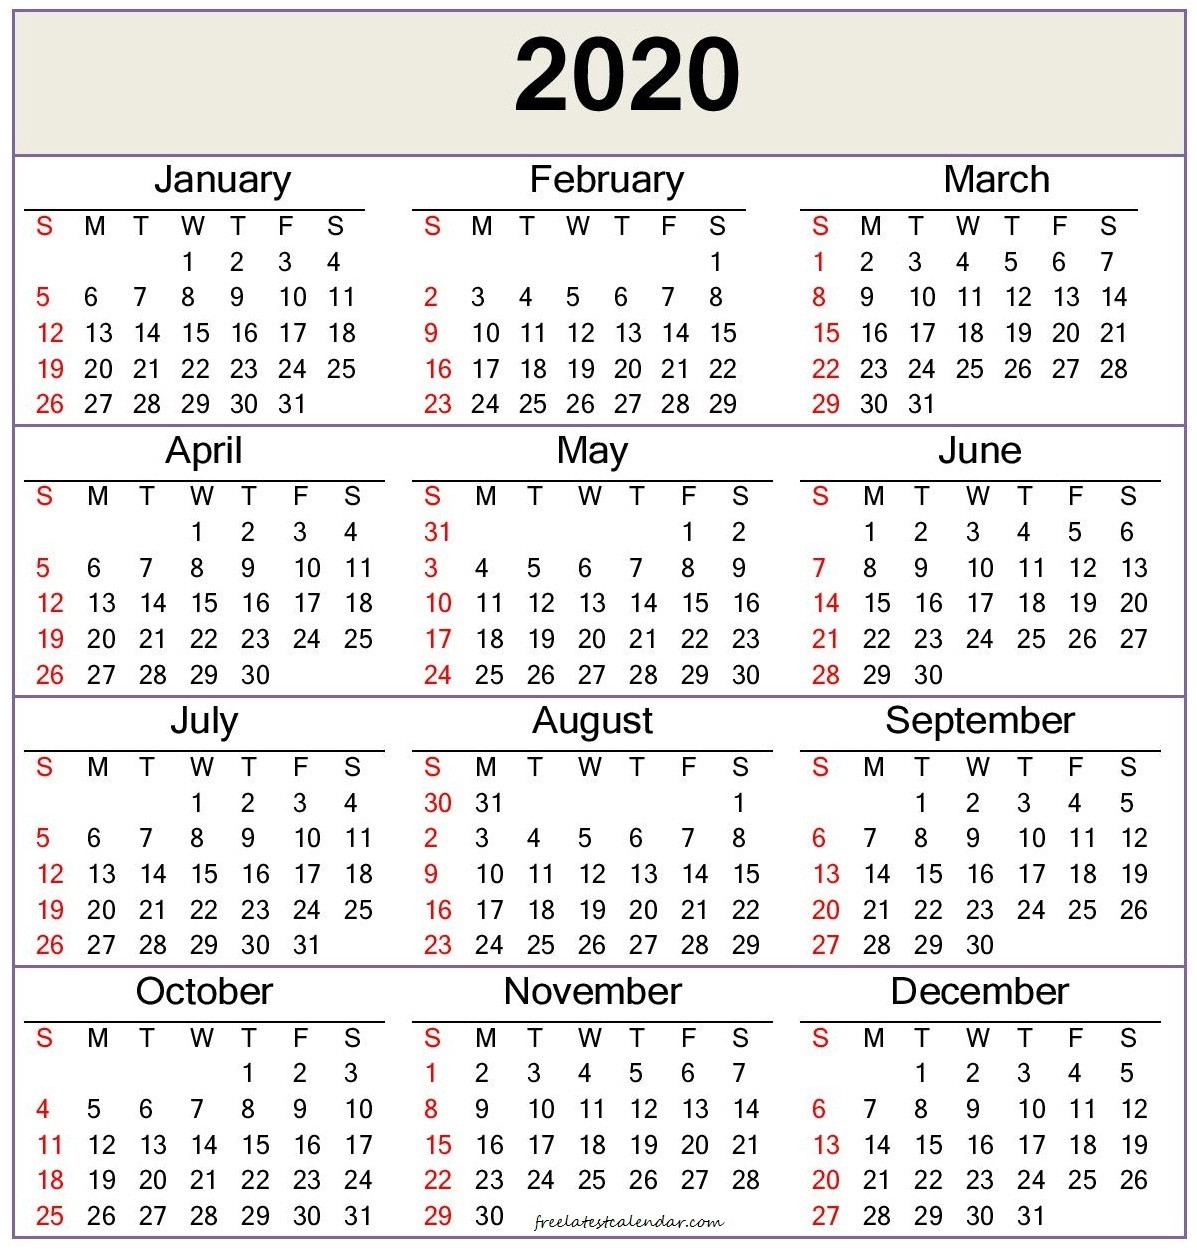 2020 Calendar Template — Word, Pdf - Free Latest Calendar-2020 Printable Microsoft Word Calendar Template